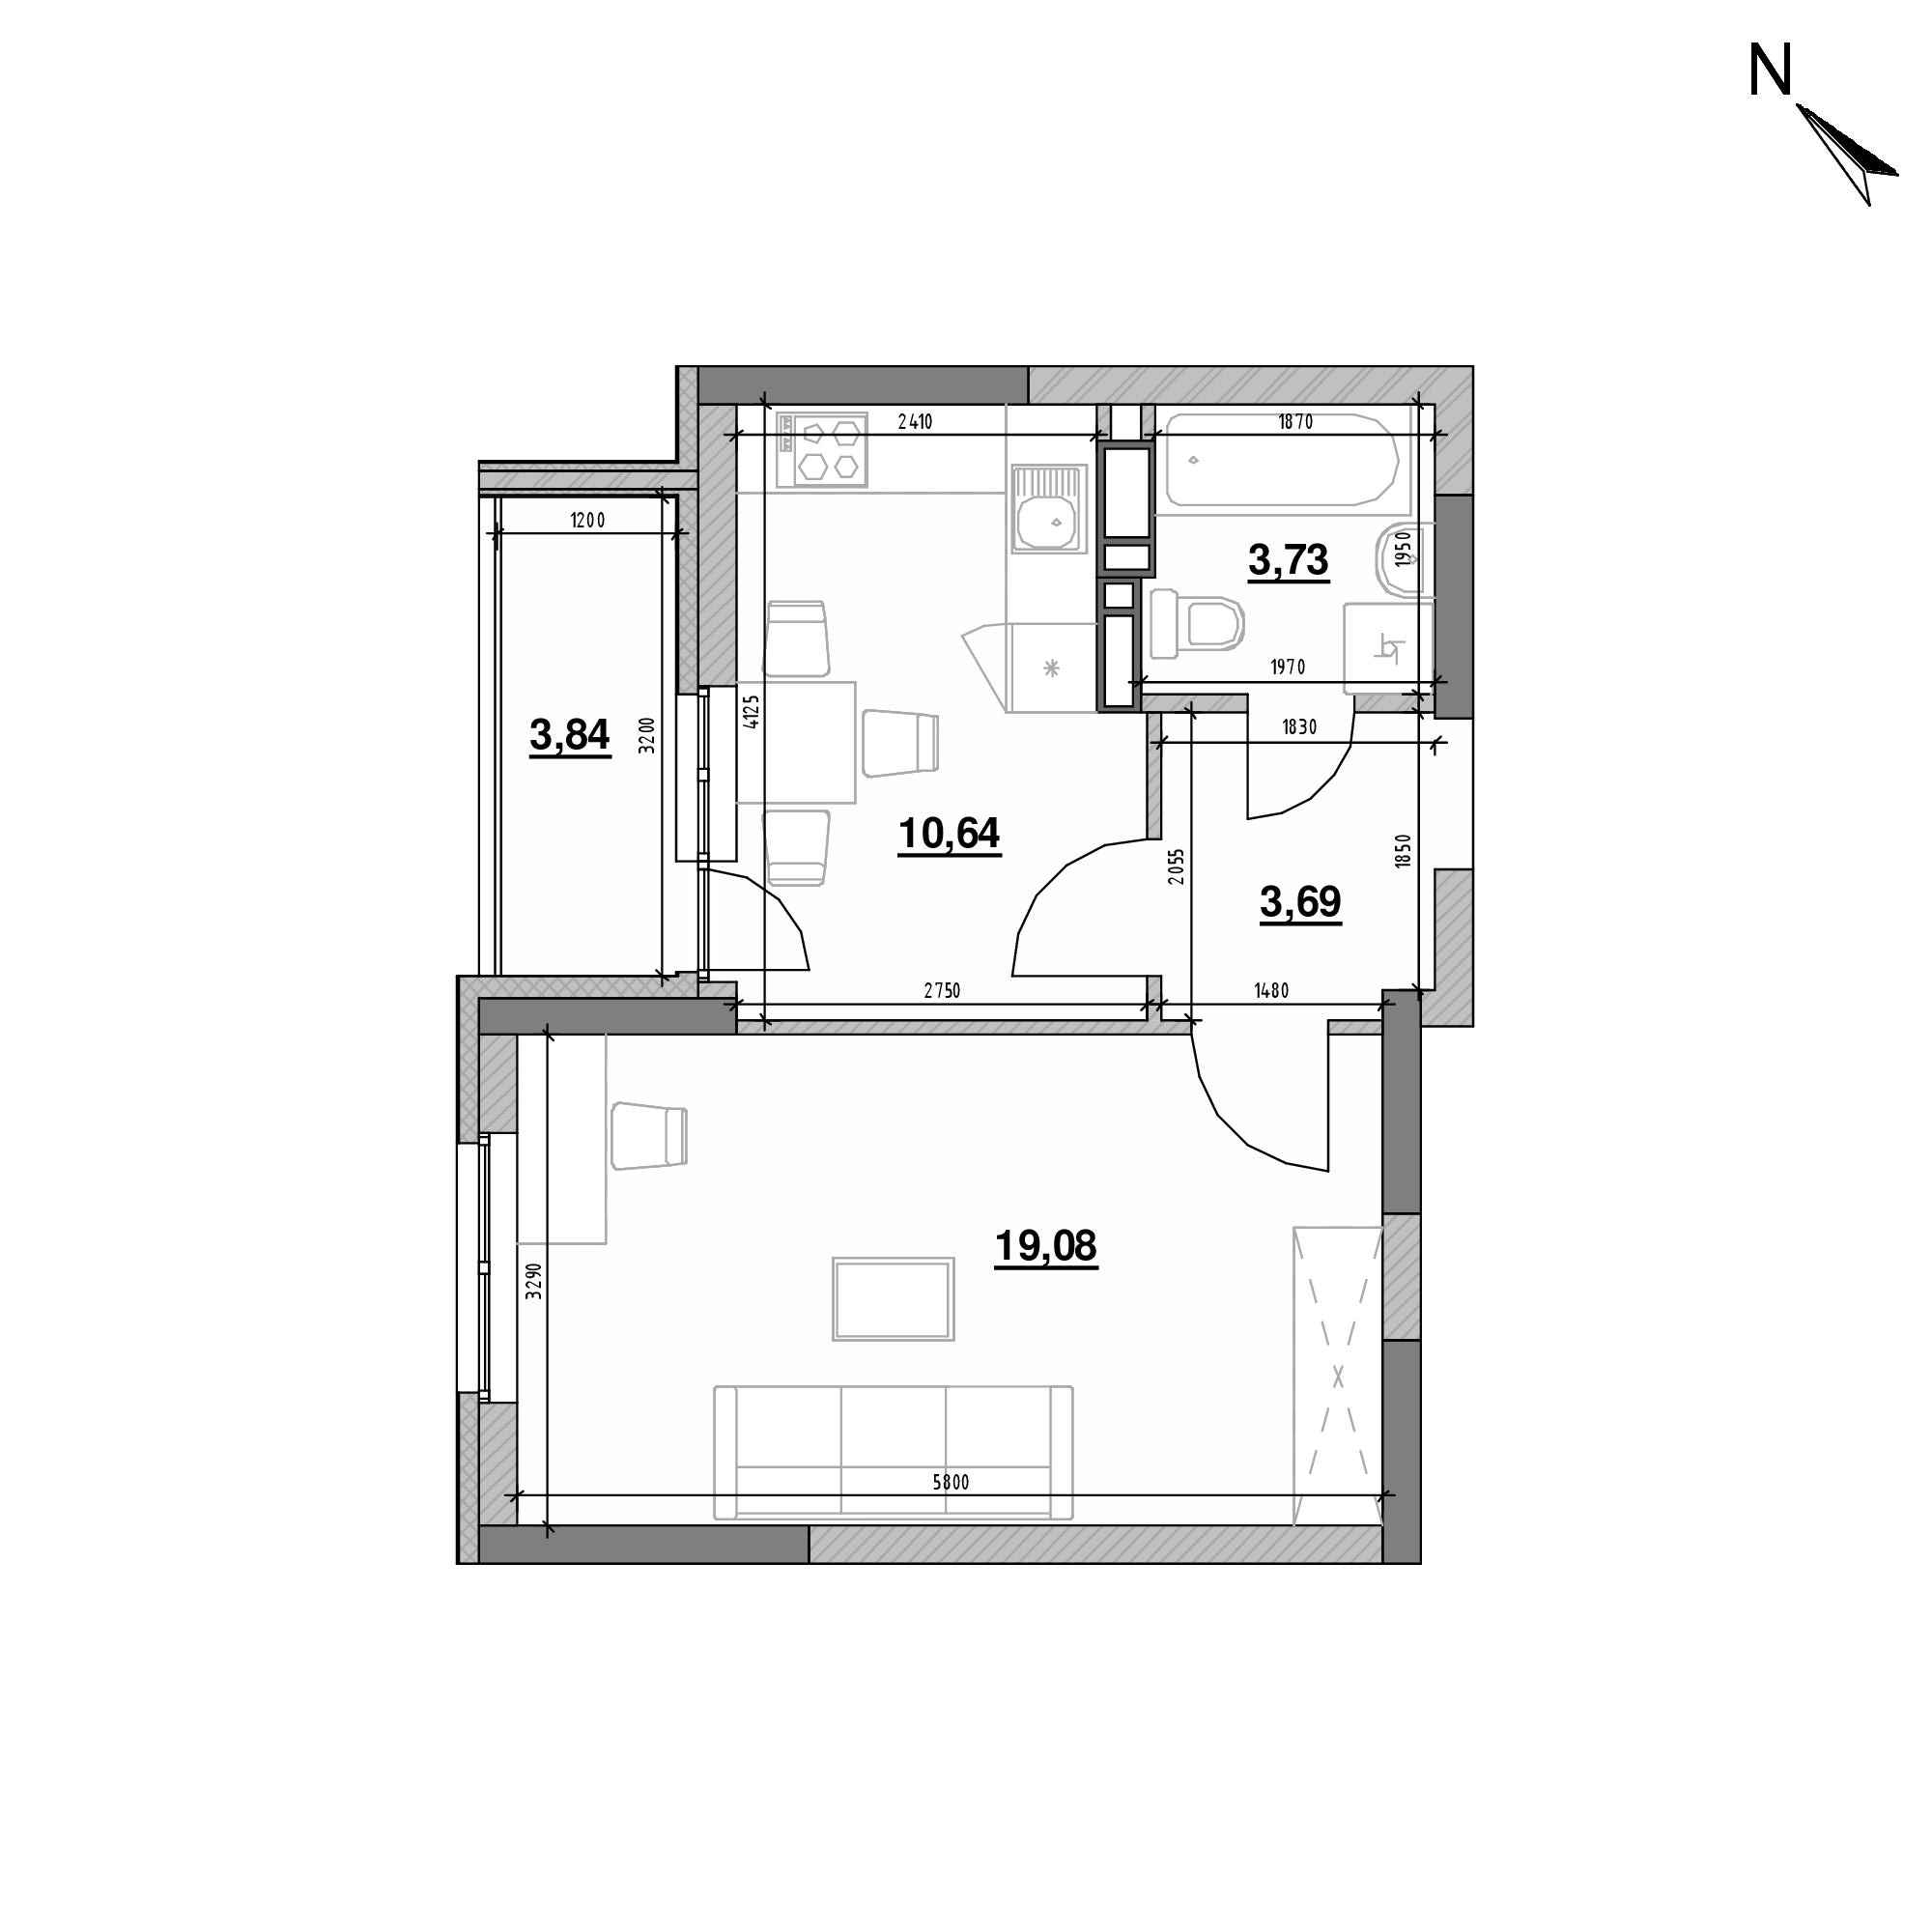 ЖК Оk'Land: планування 1-кімнатної квартири, №192, 40.98 м<sup>2</sup>